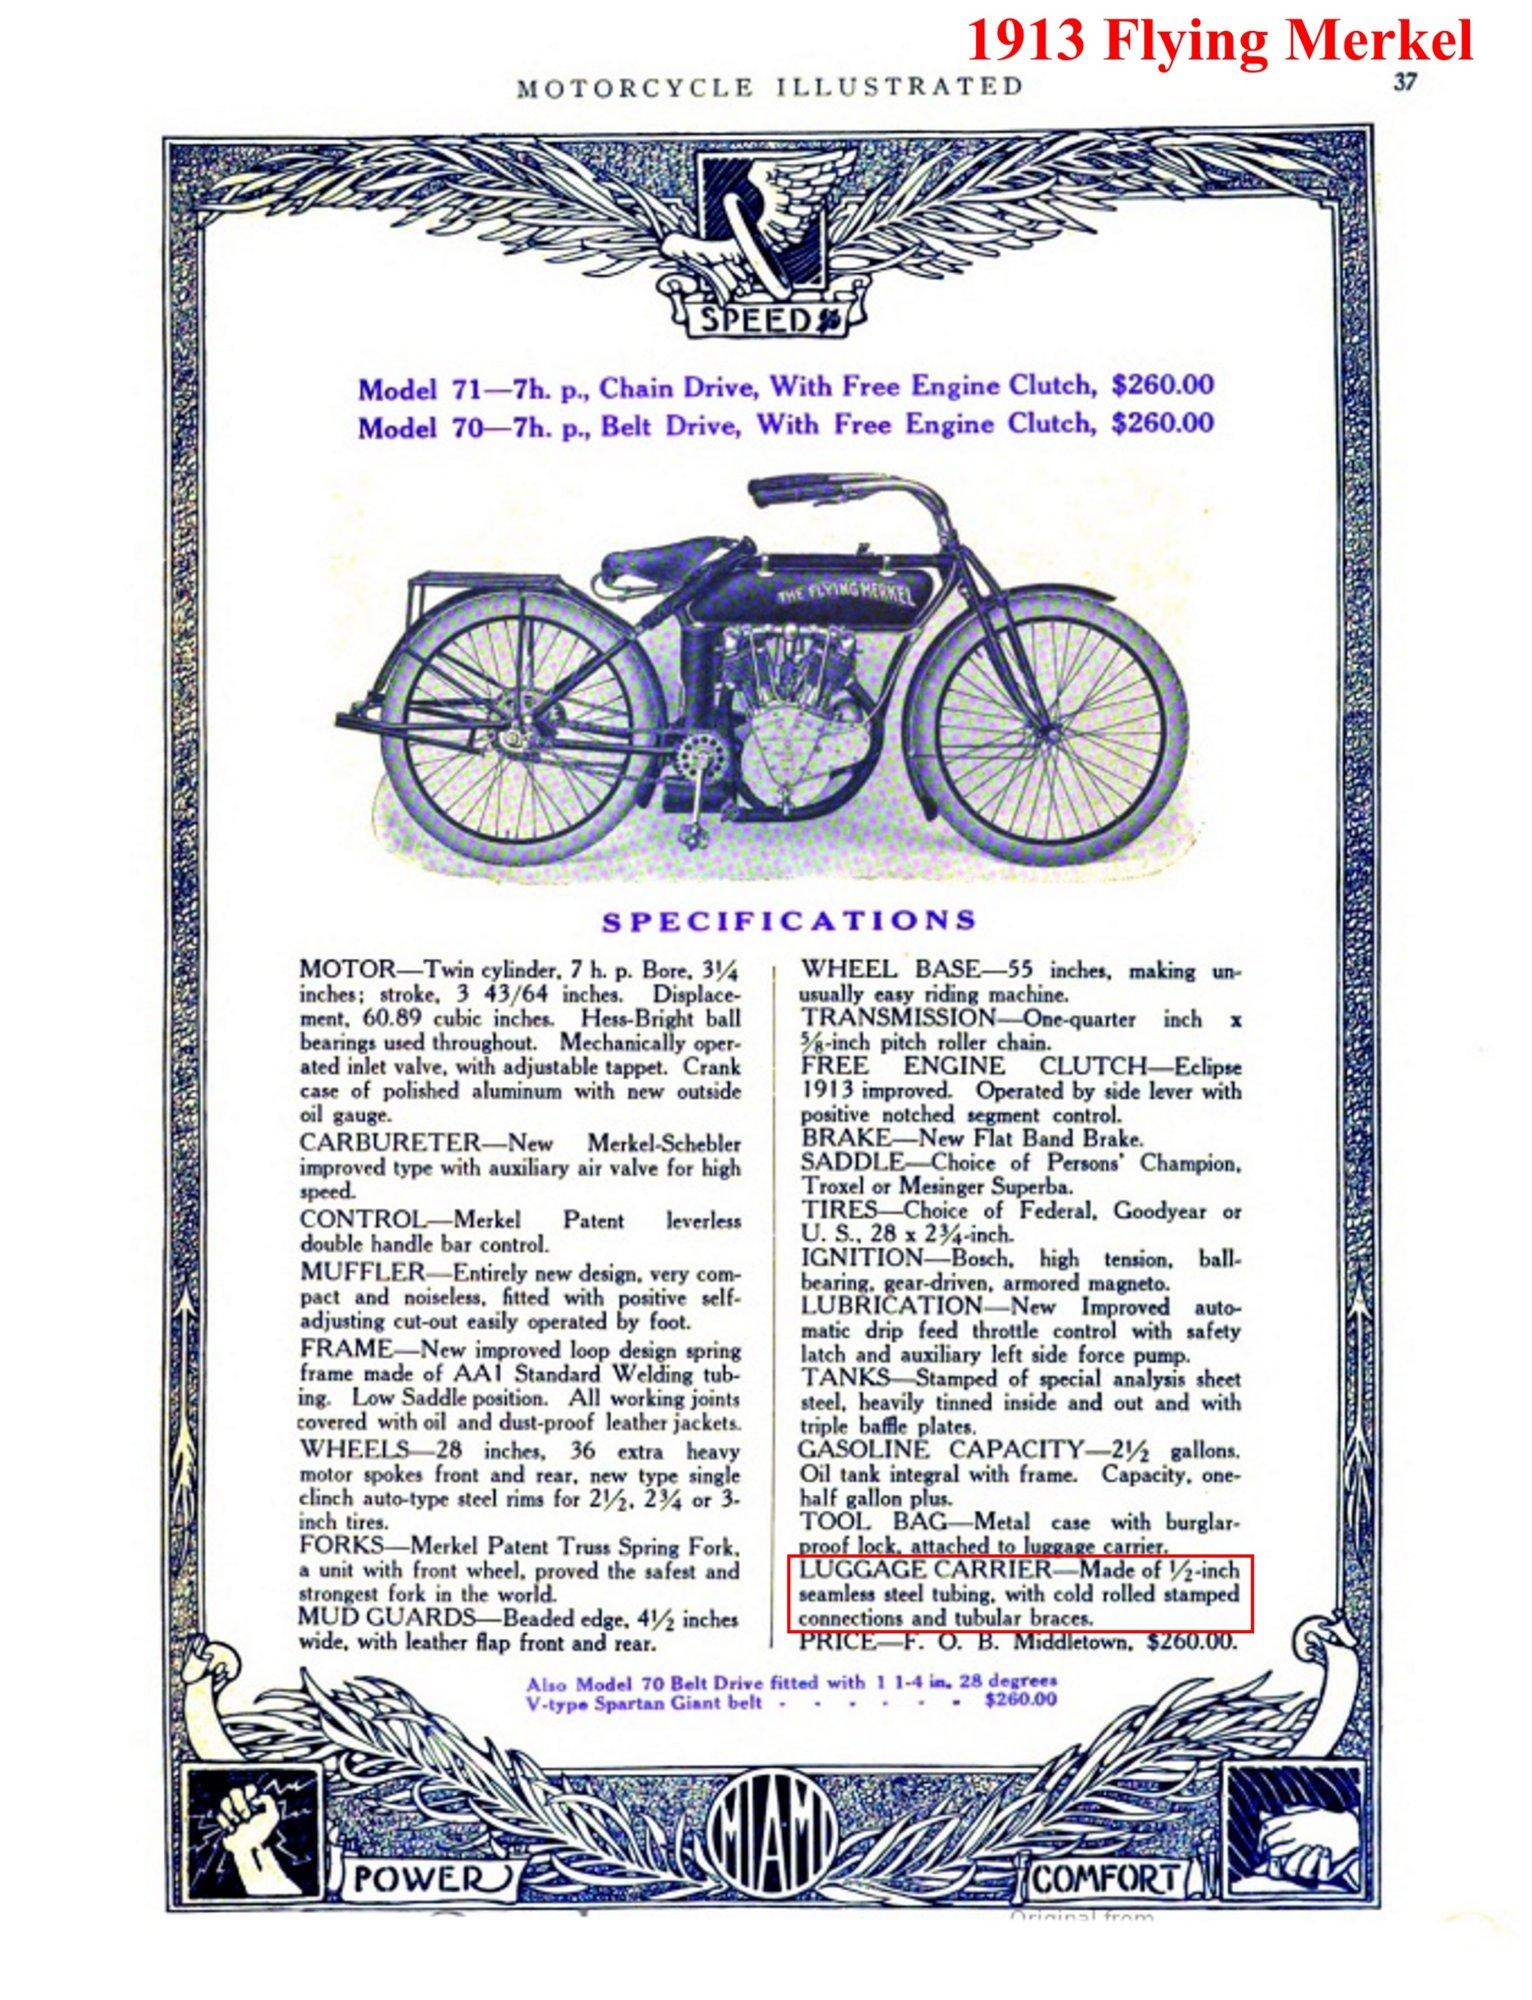 image 1913 f-m 11.jpg